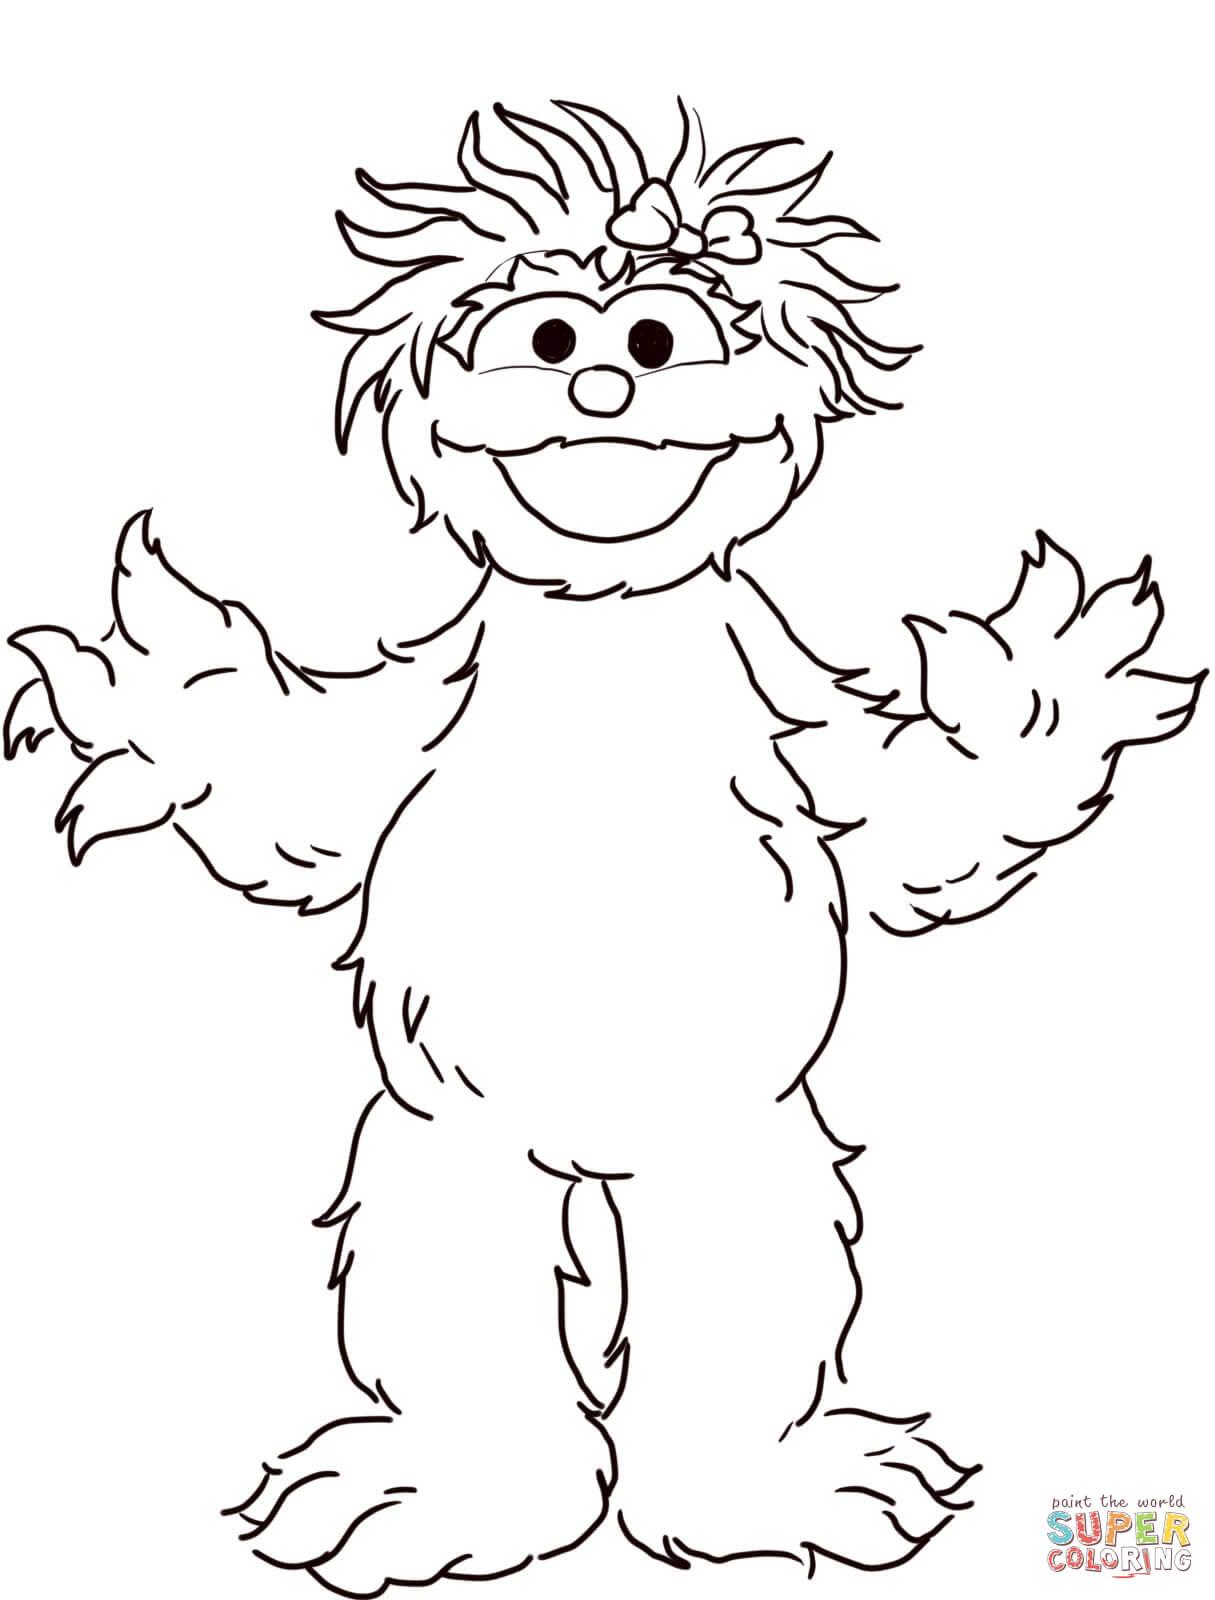 Sesame Street Sign Coloring Page Sesame Street Coloring Pages Free Coloring Pages